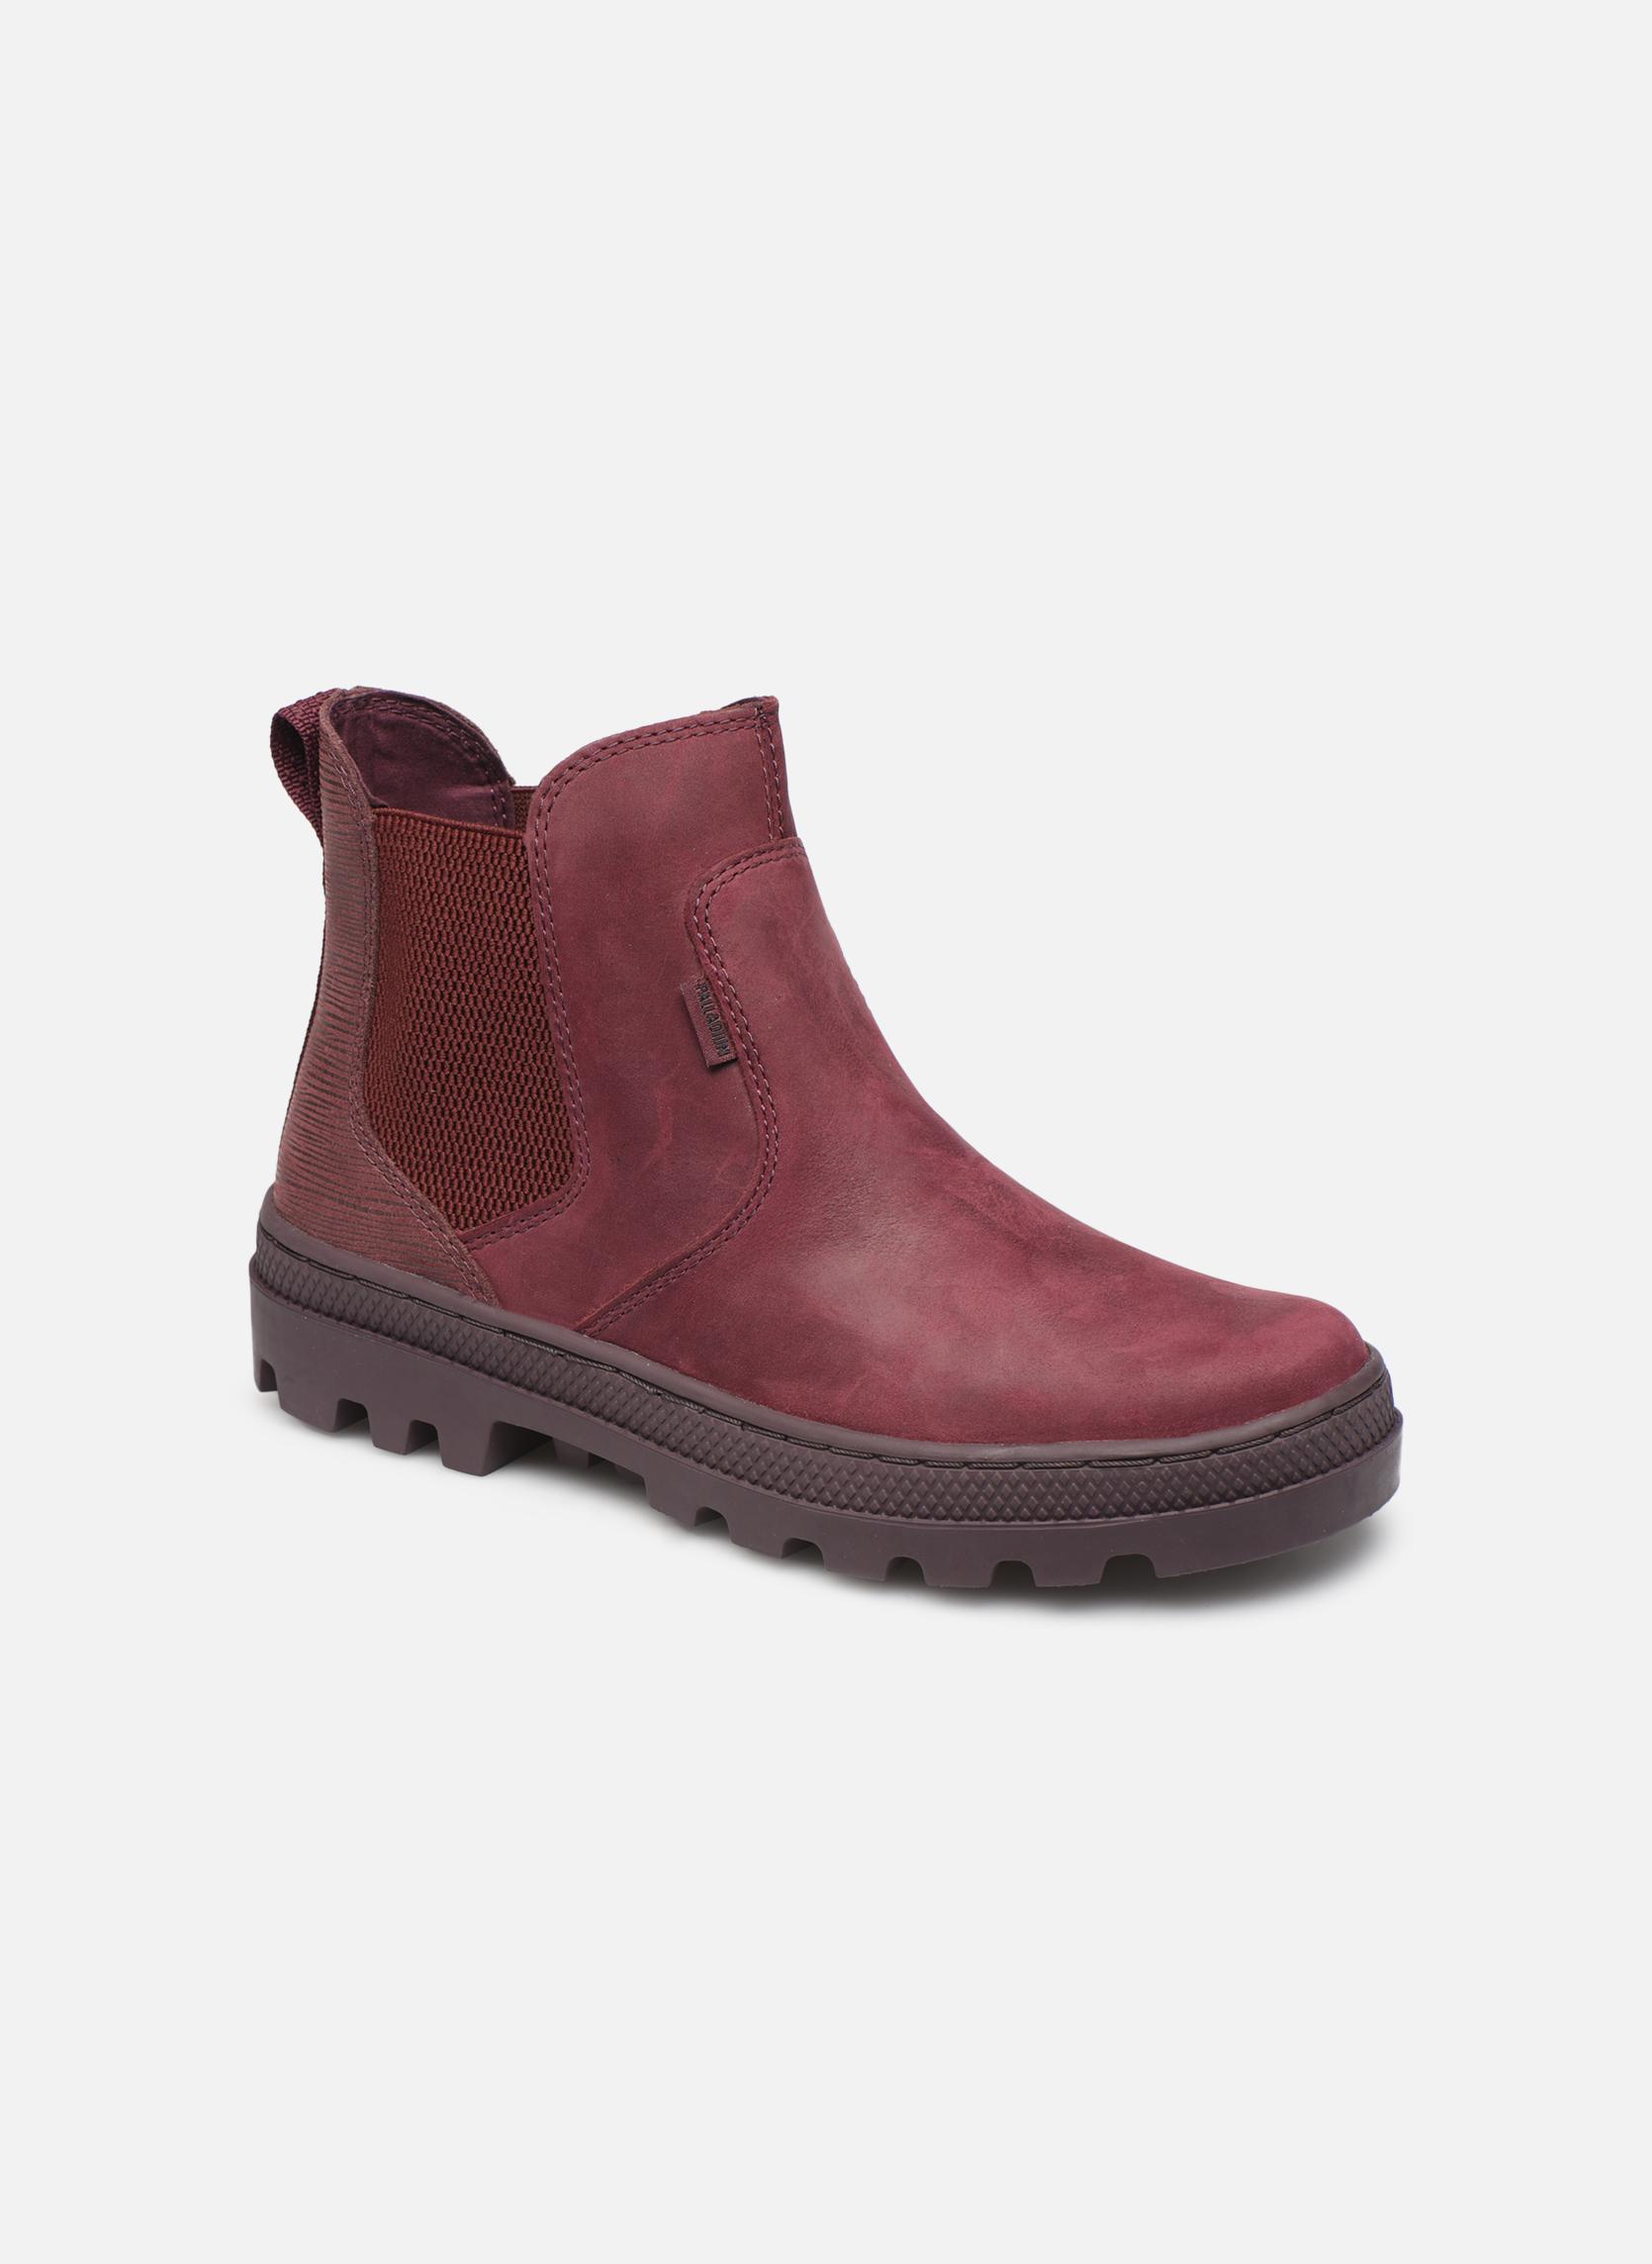 Boots en enkellaarsjes Palladium Bordeaux